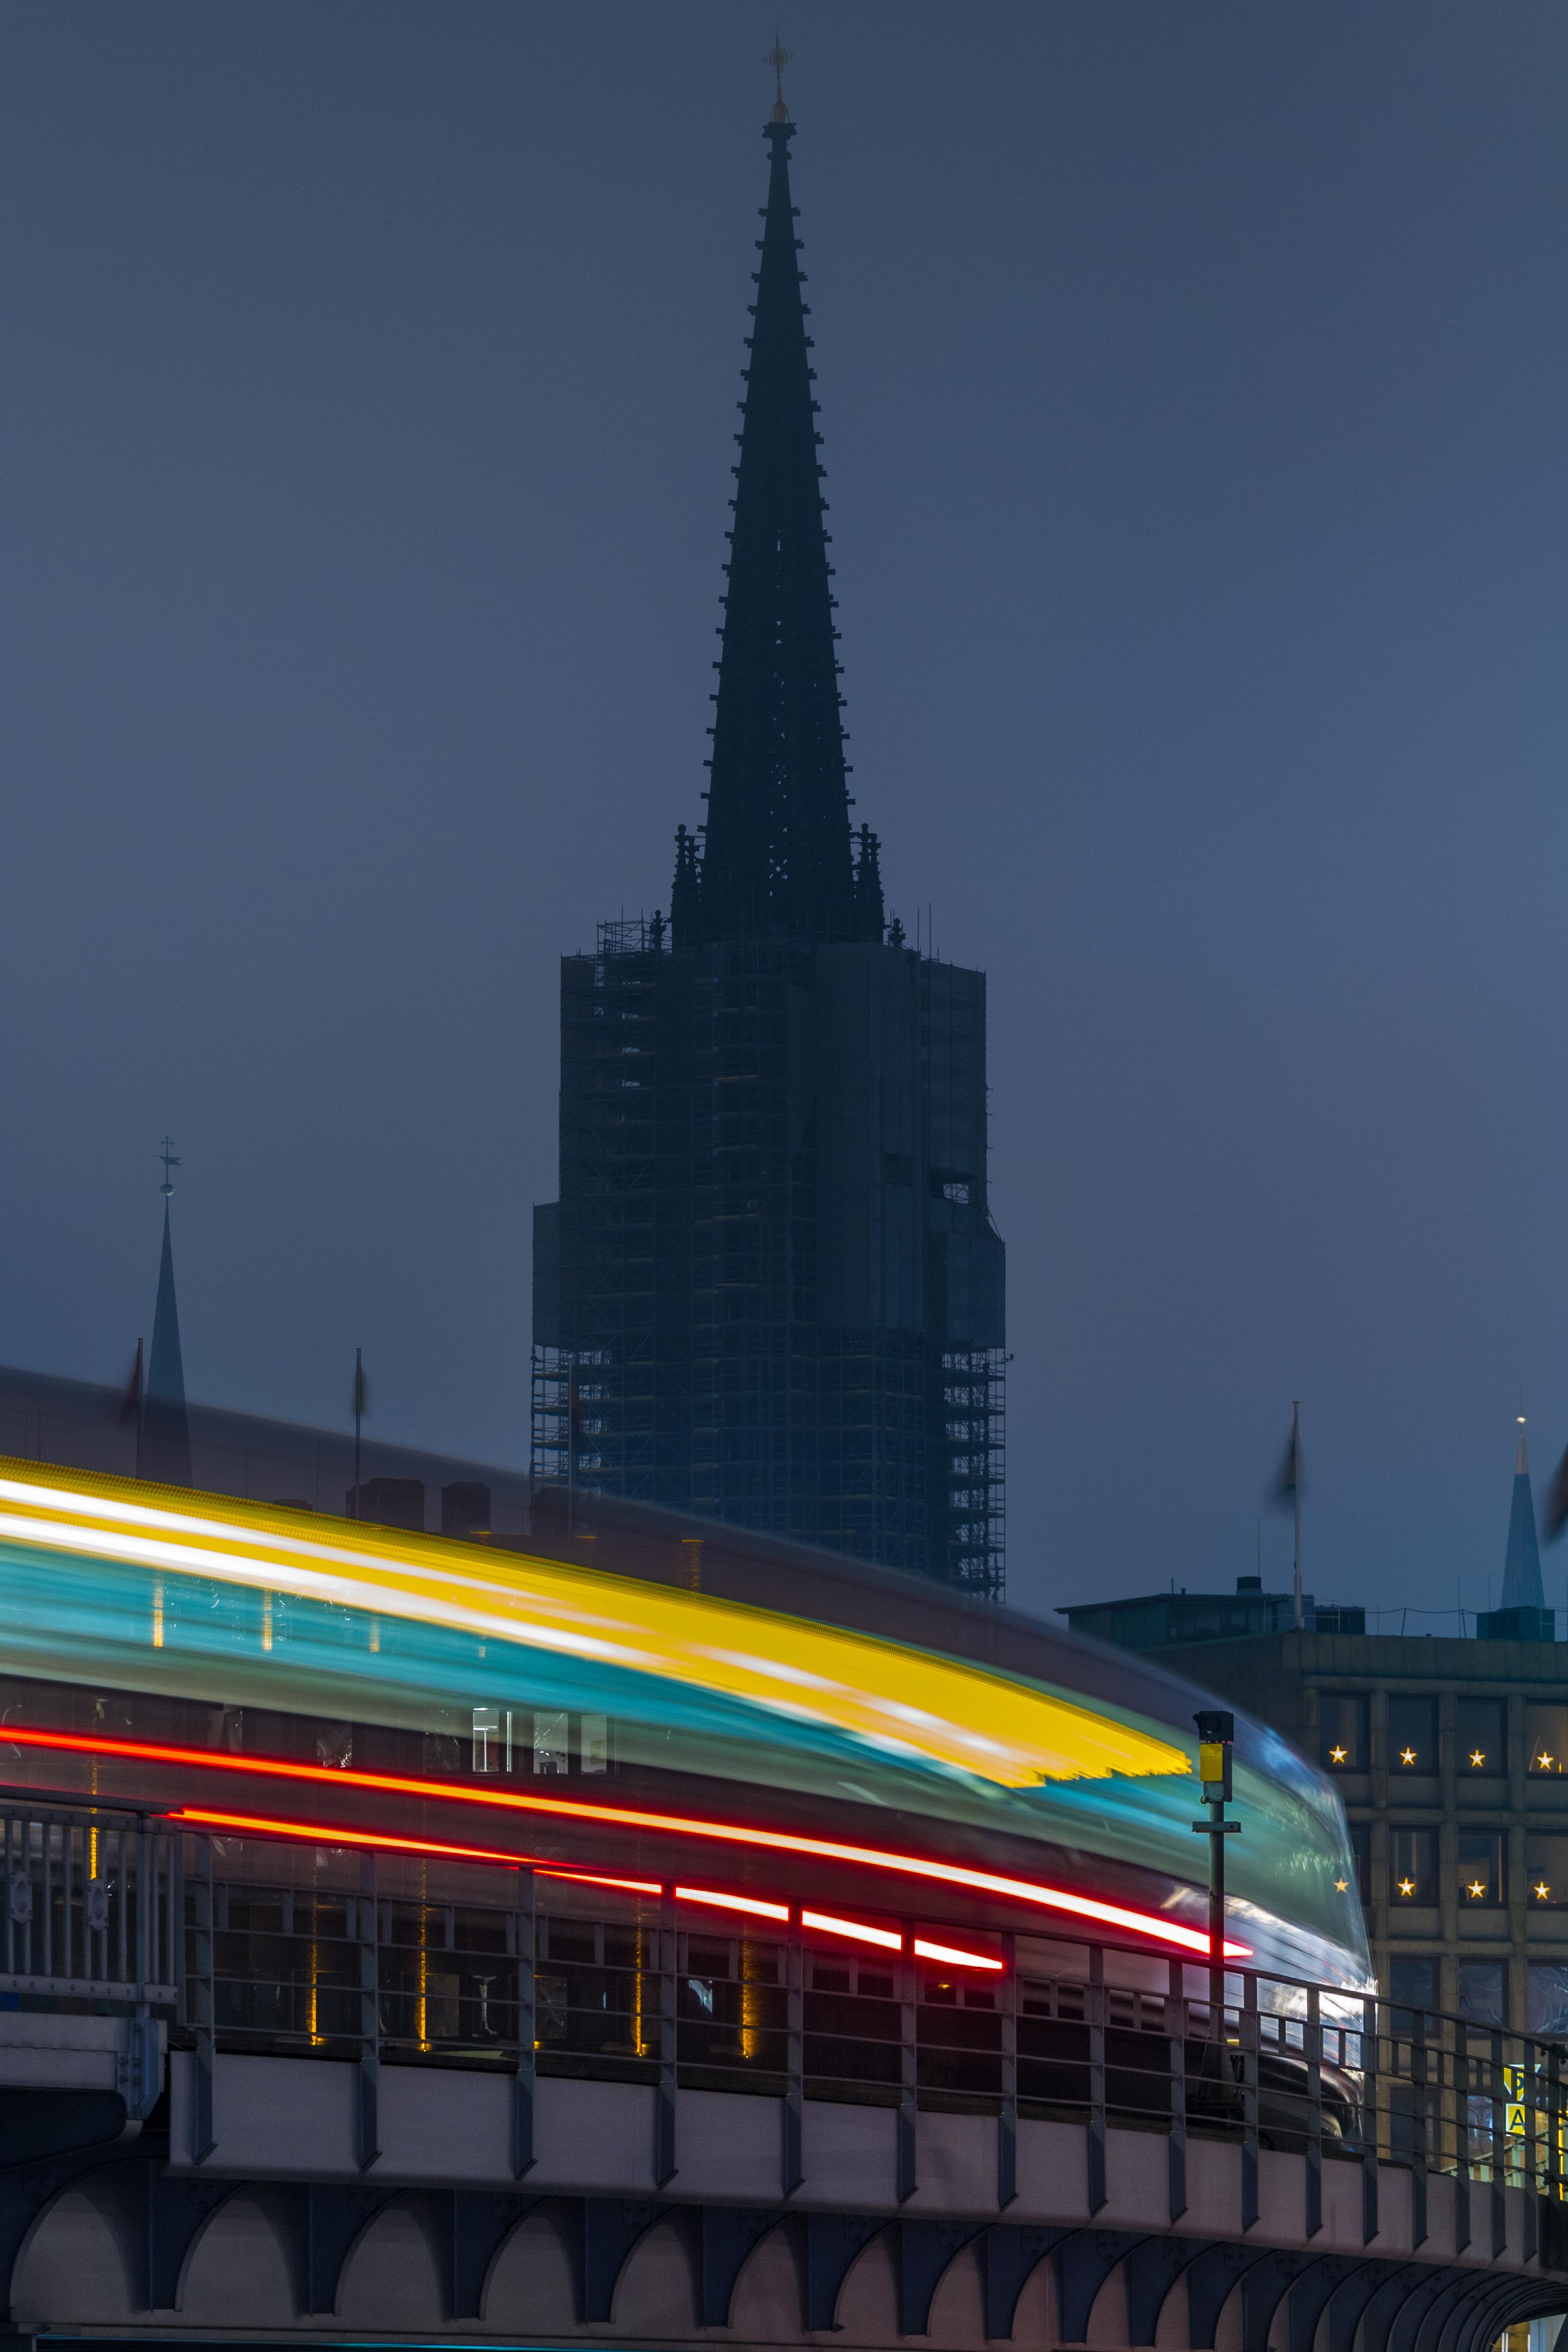 Hamburg city lights, die Bahn kommt